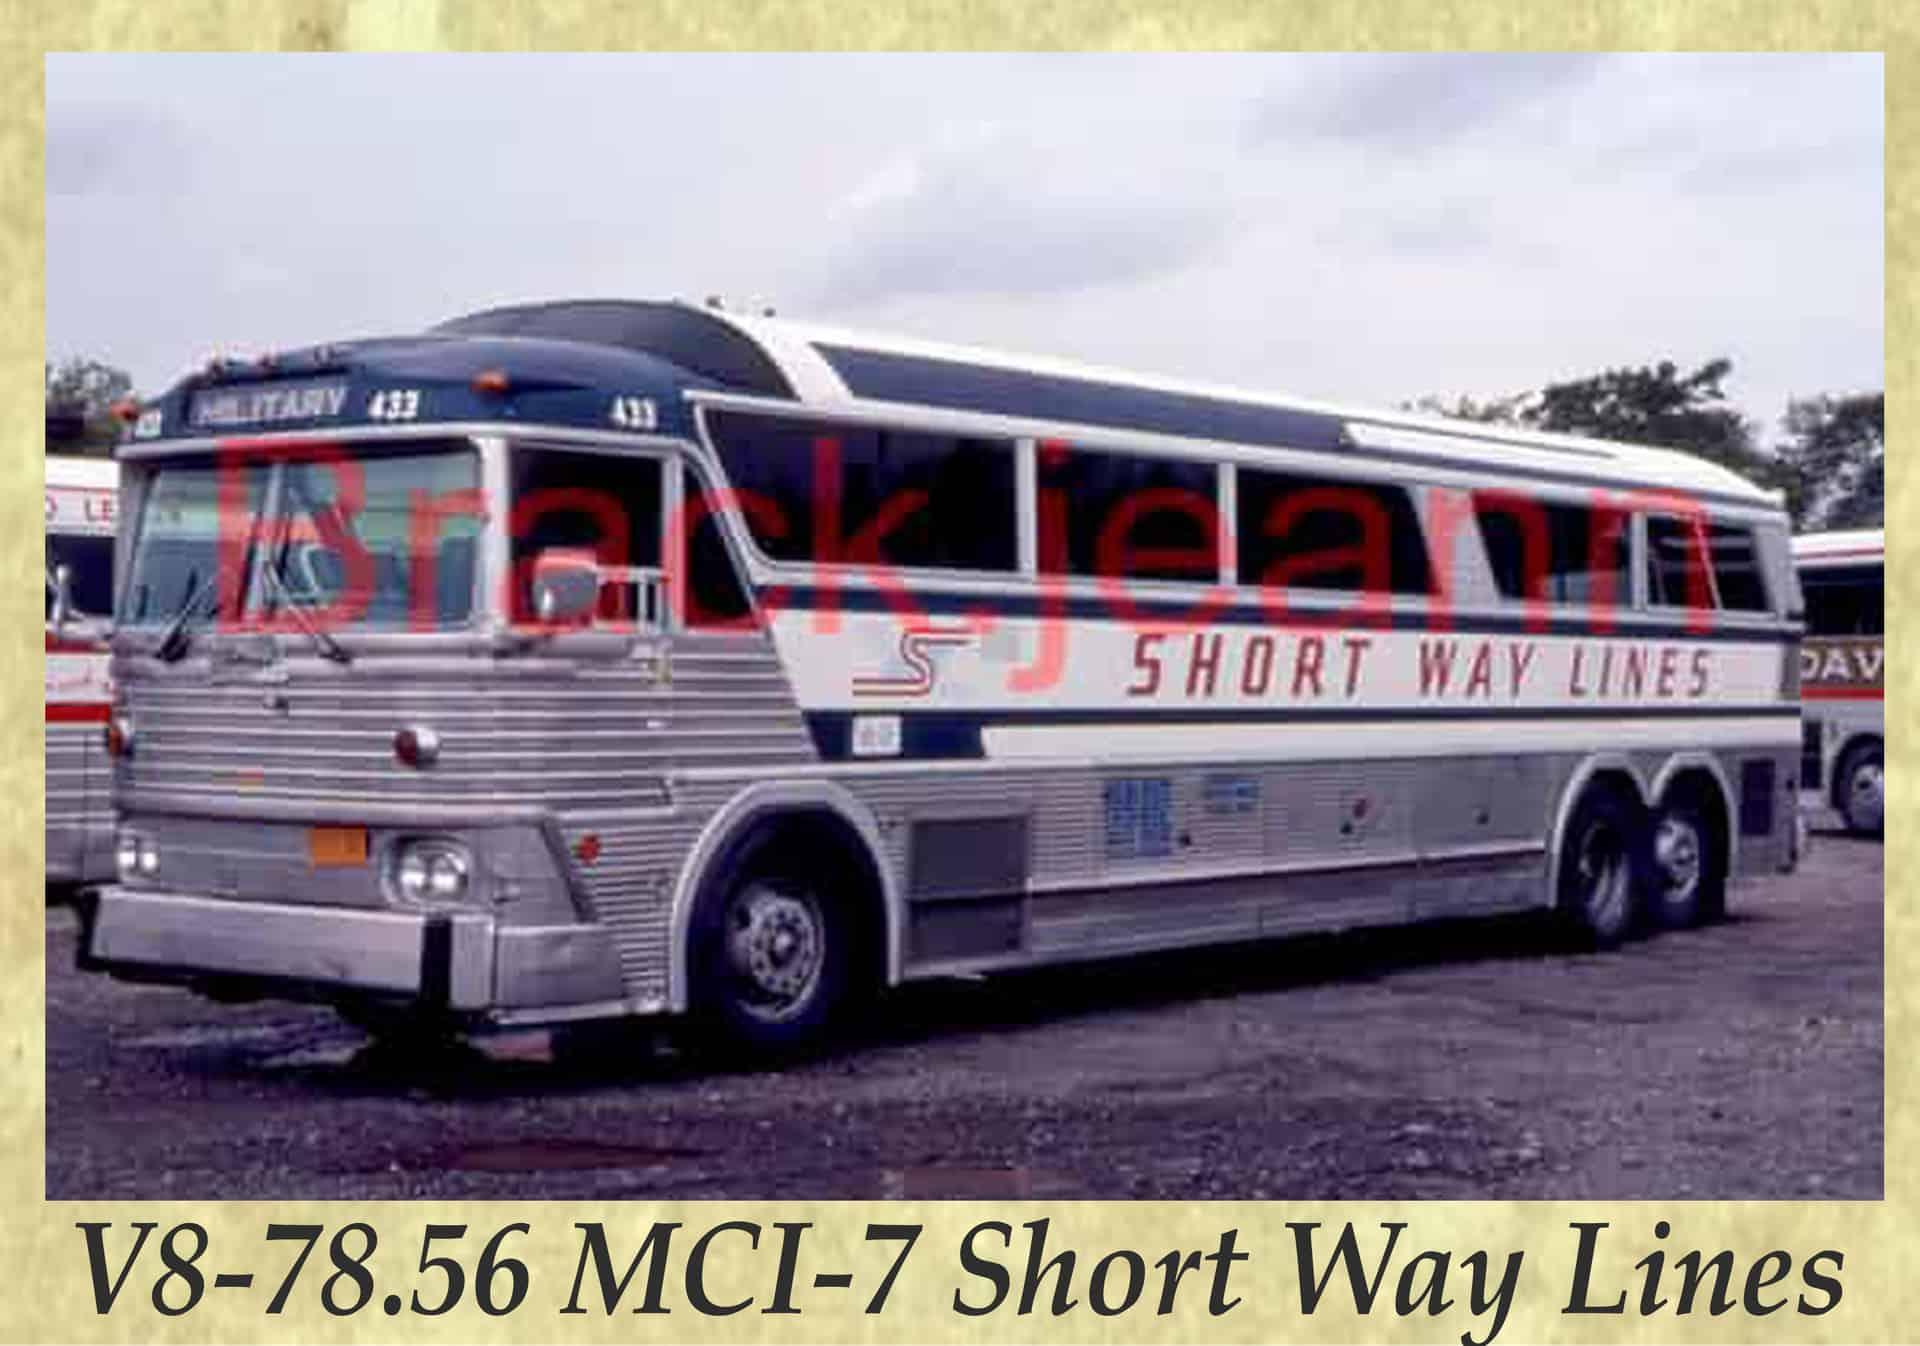 V8-78.56 MCI-7 Short Way Lines